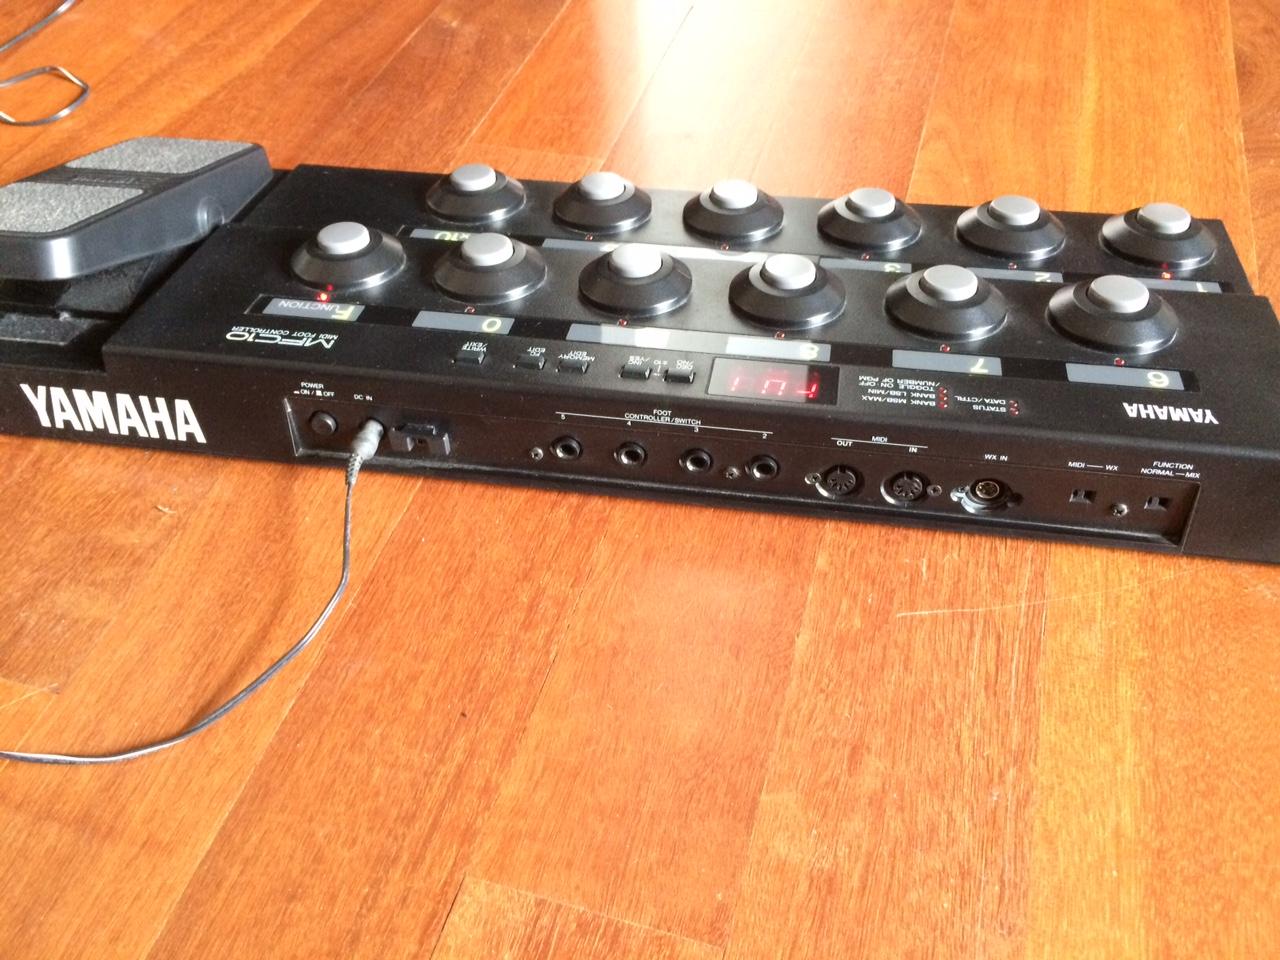 yamaha mfc 10 midi foot controller image 1477382